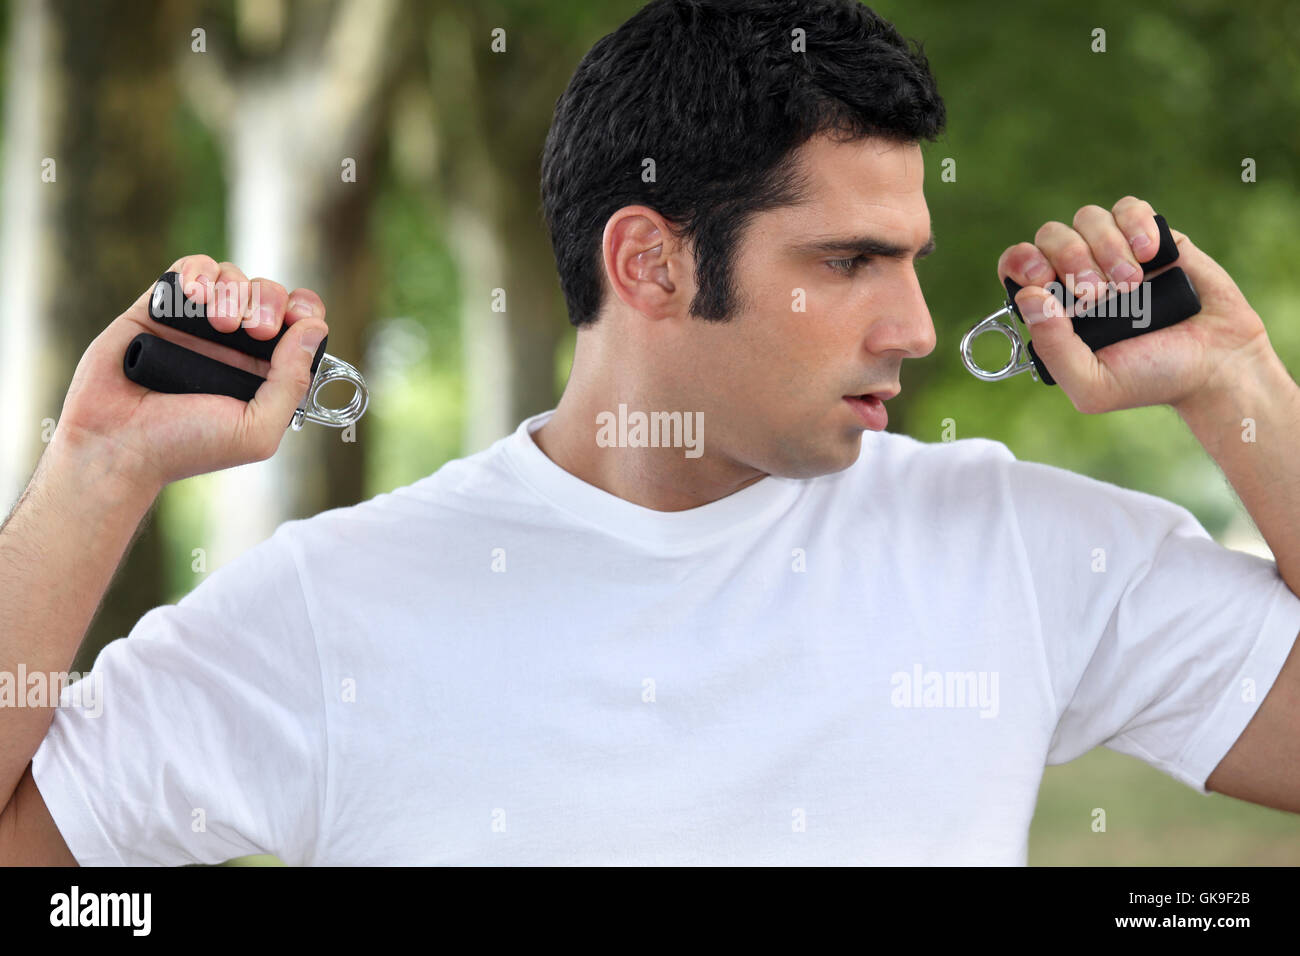 L'équipement d'exercice actif Photo Stock